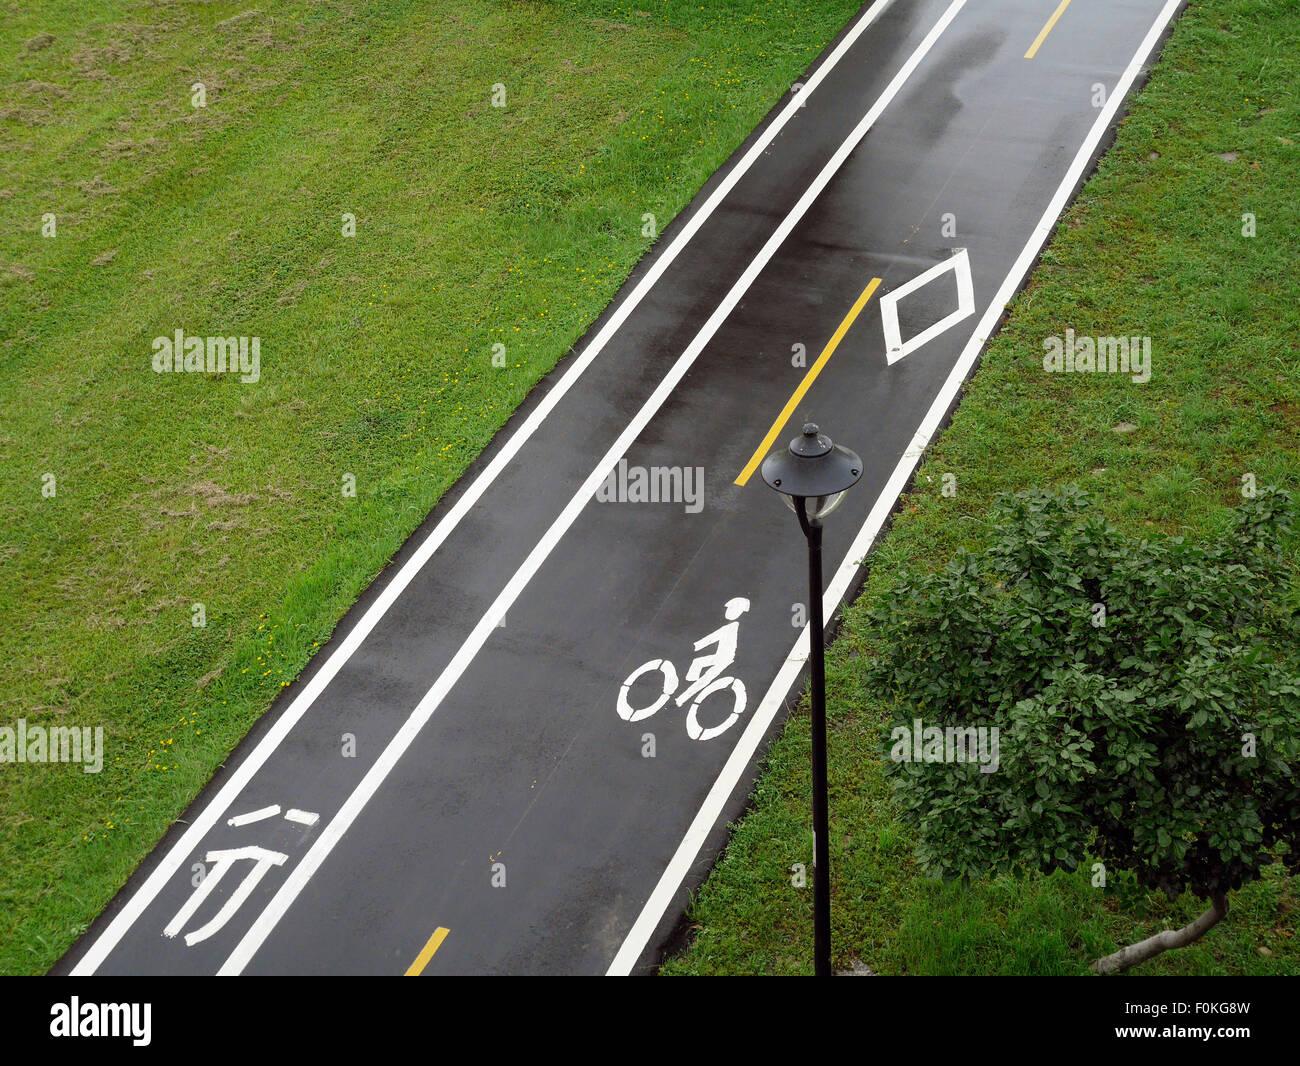 Taiwan, Taipeh, empty bicycle lane - Stock Image